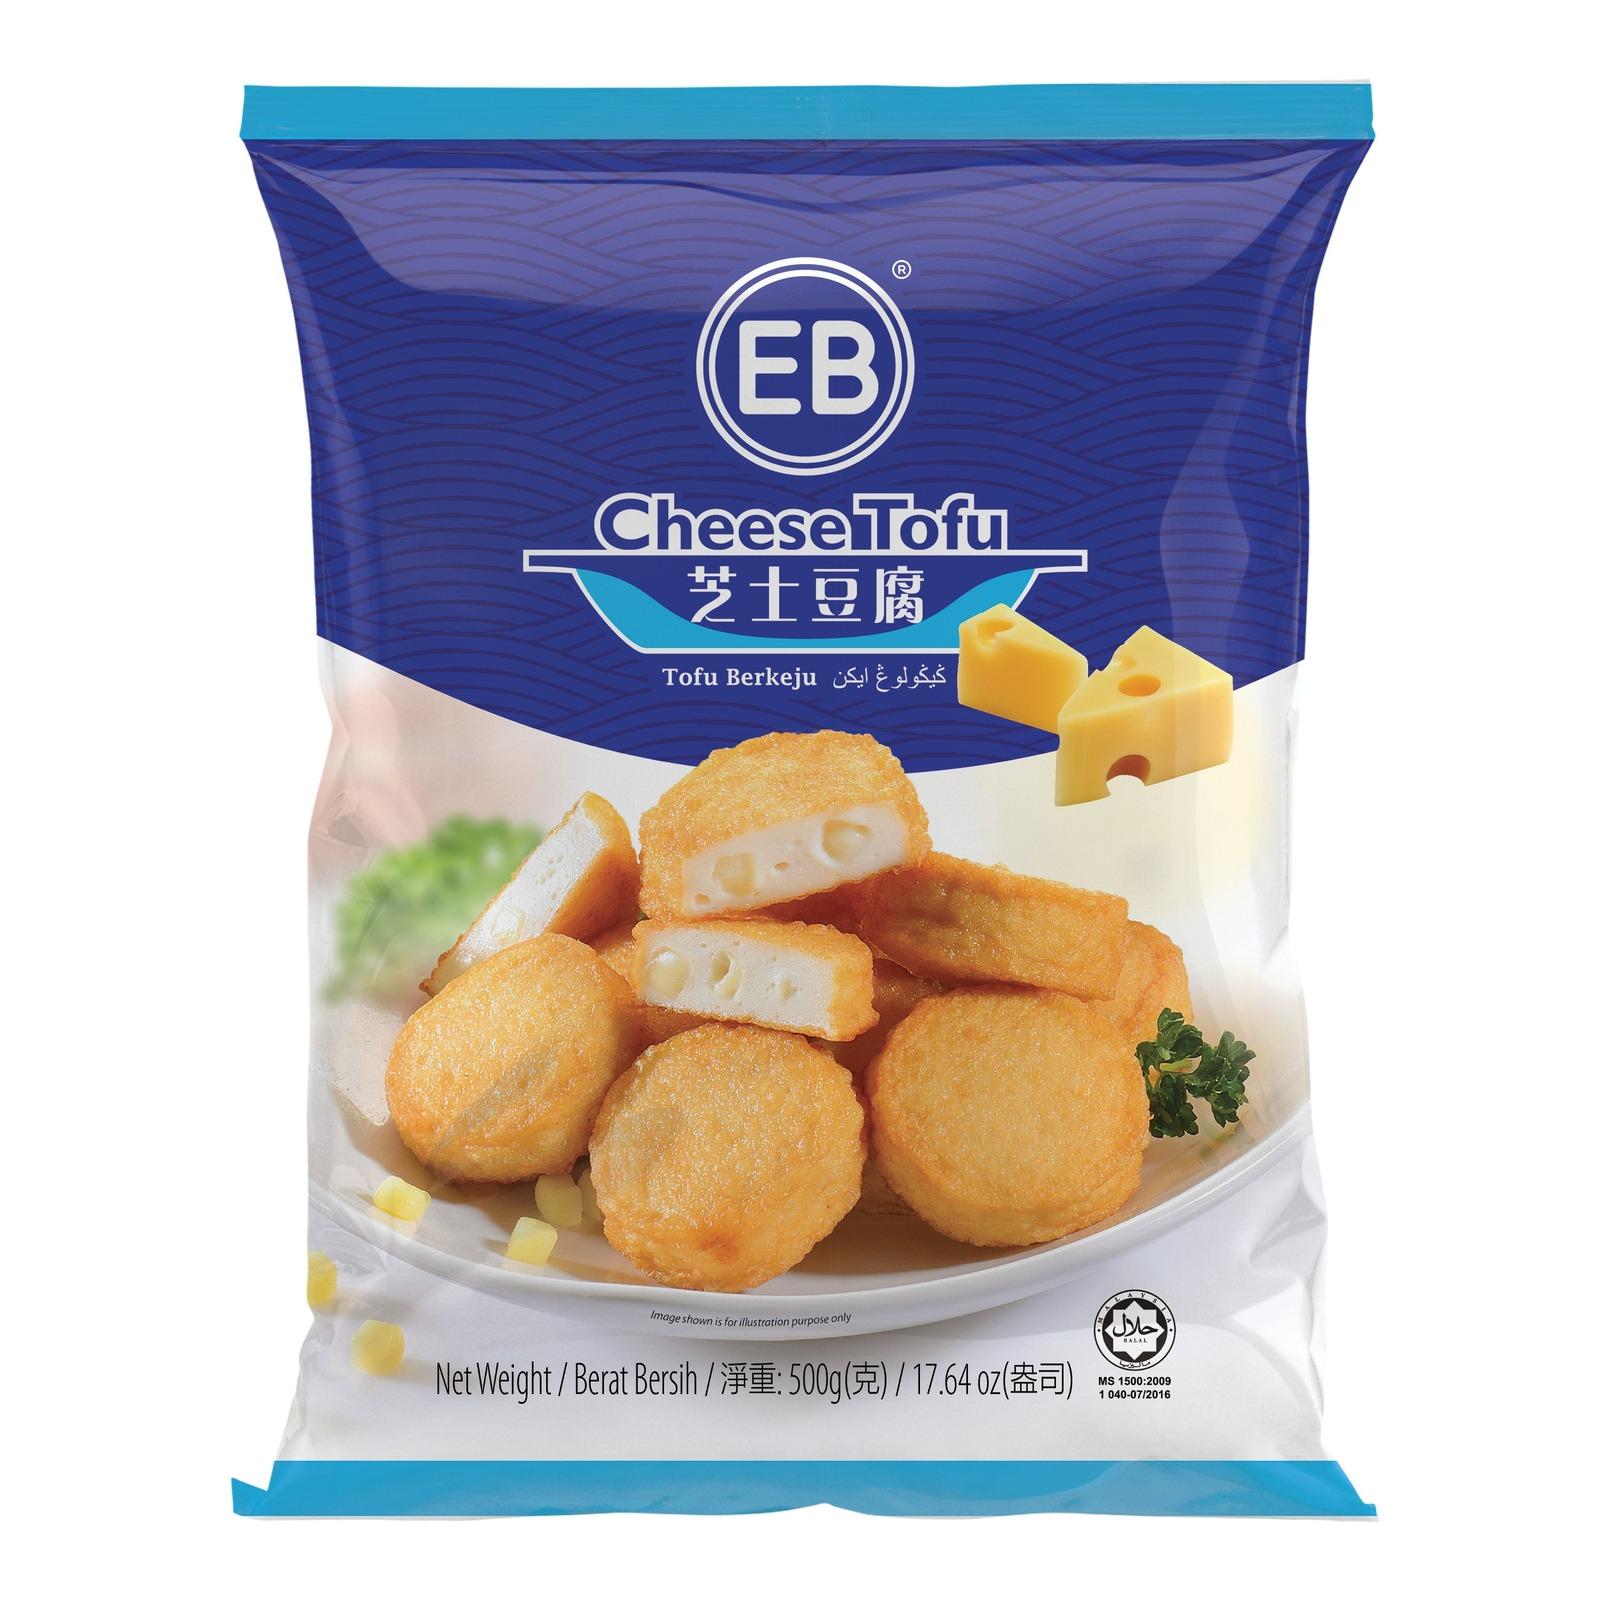 EB Frozen - Cheese Tofu